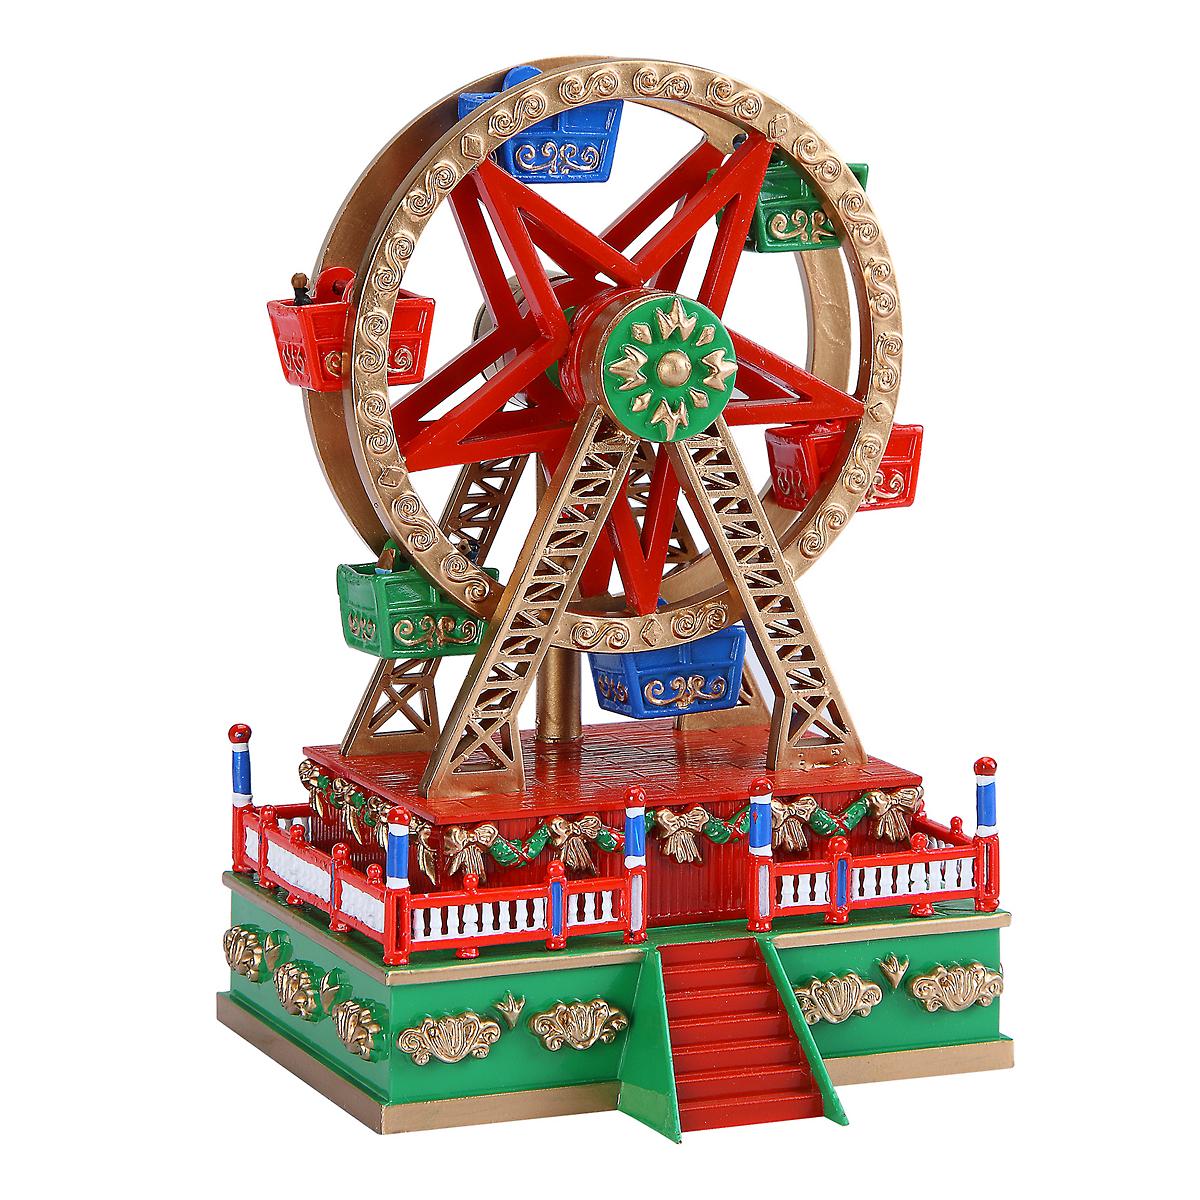 Mr. Christmas Mini Ferris Wheel Musical | Gump's